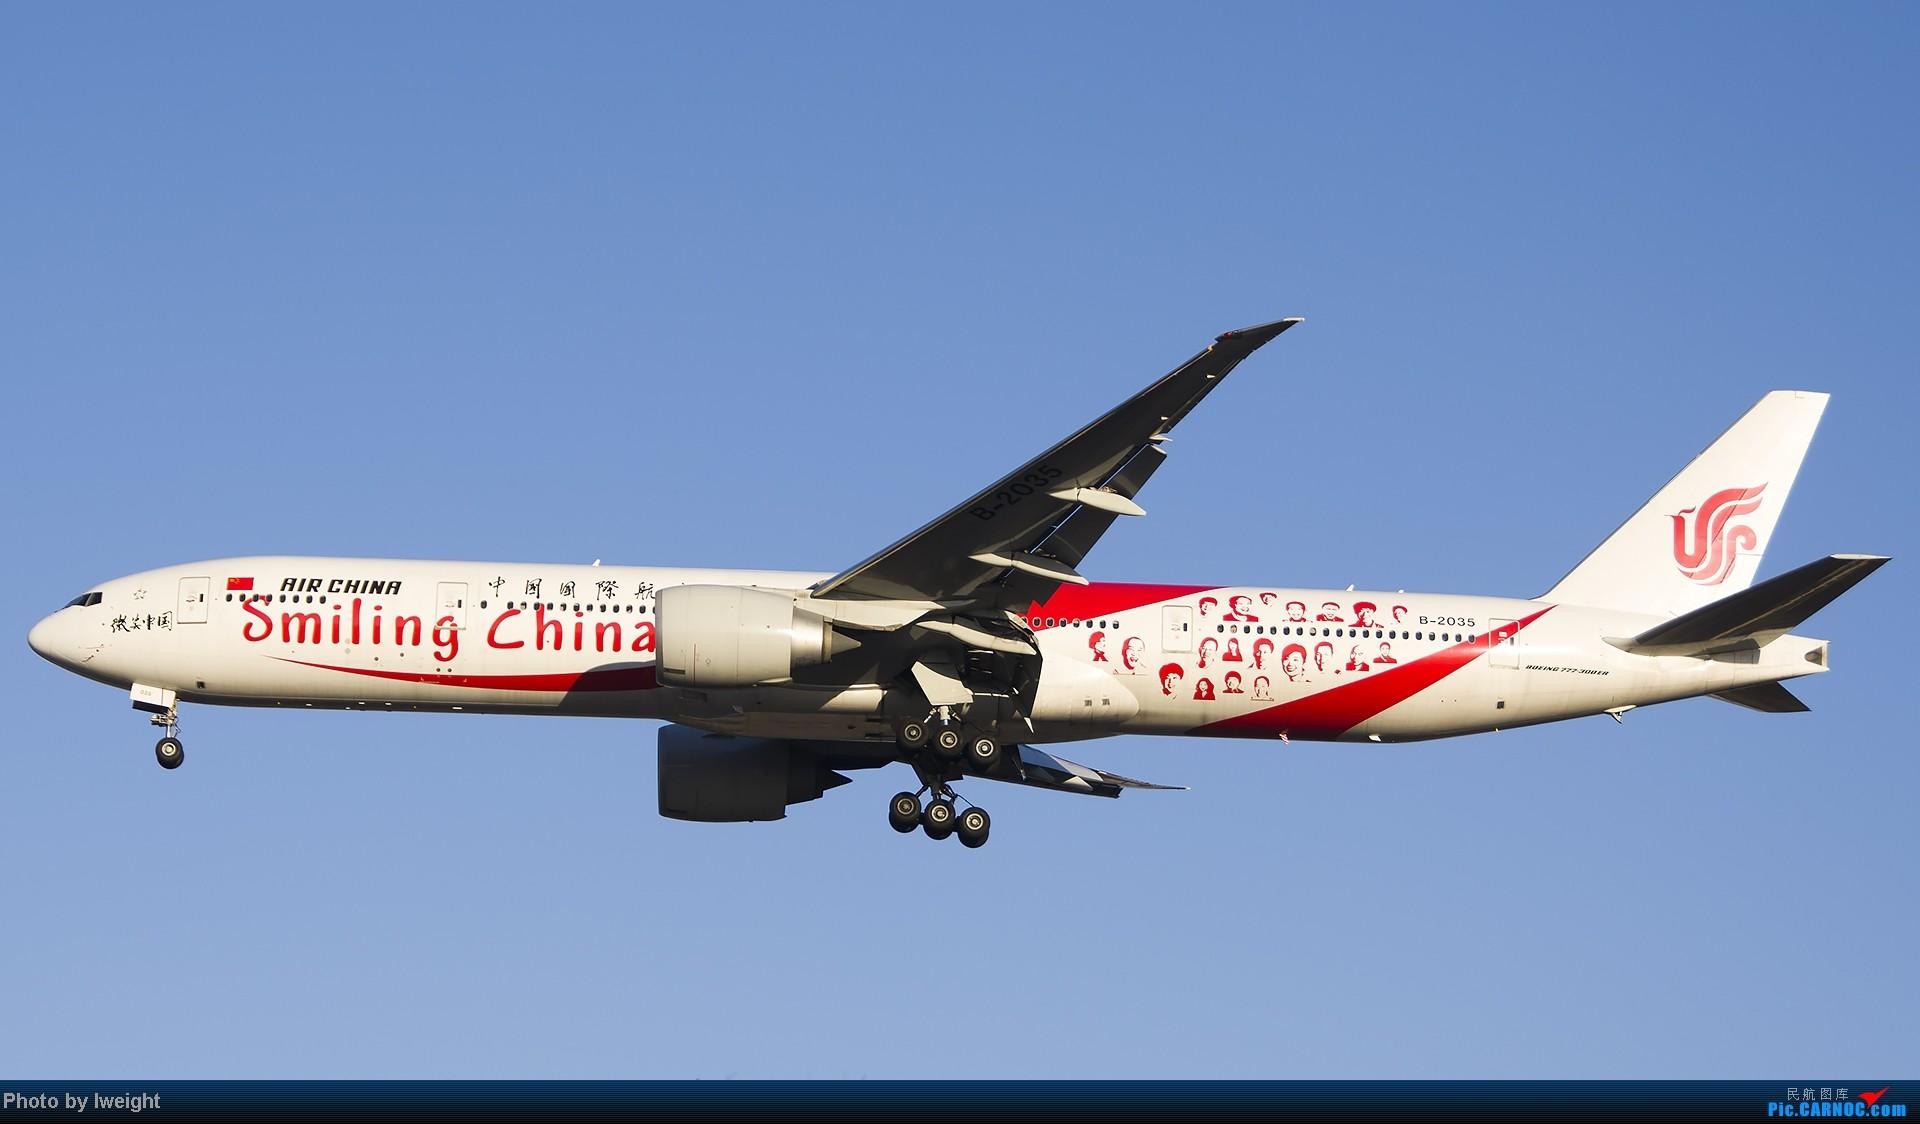 Re:[原创]抓住APEC蓝的尾巴,再拍上一组 BOEING 777-300ER B-2035 中国北京首都机场